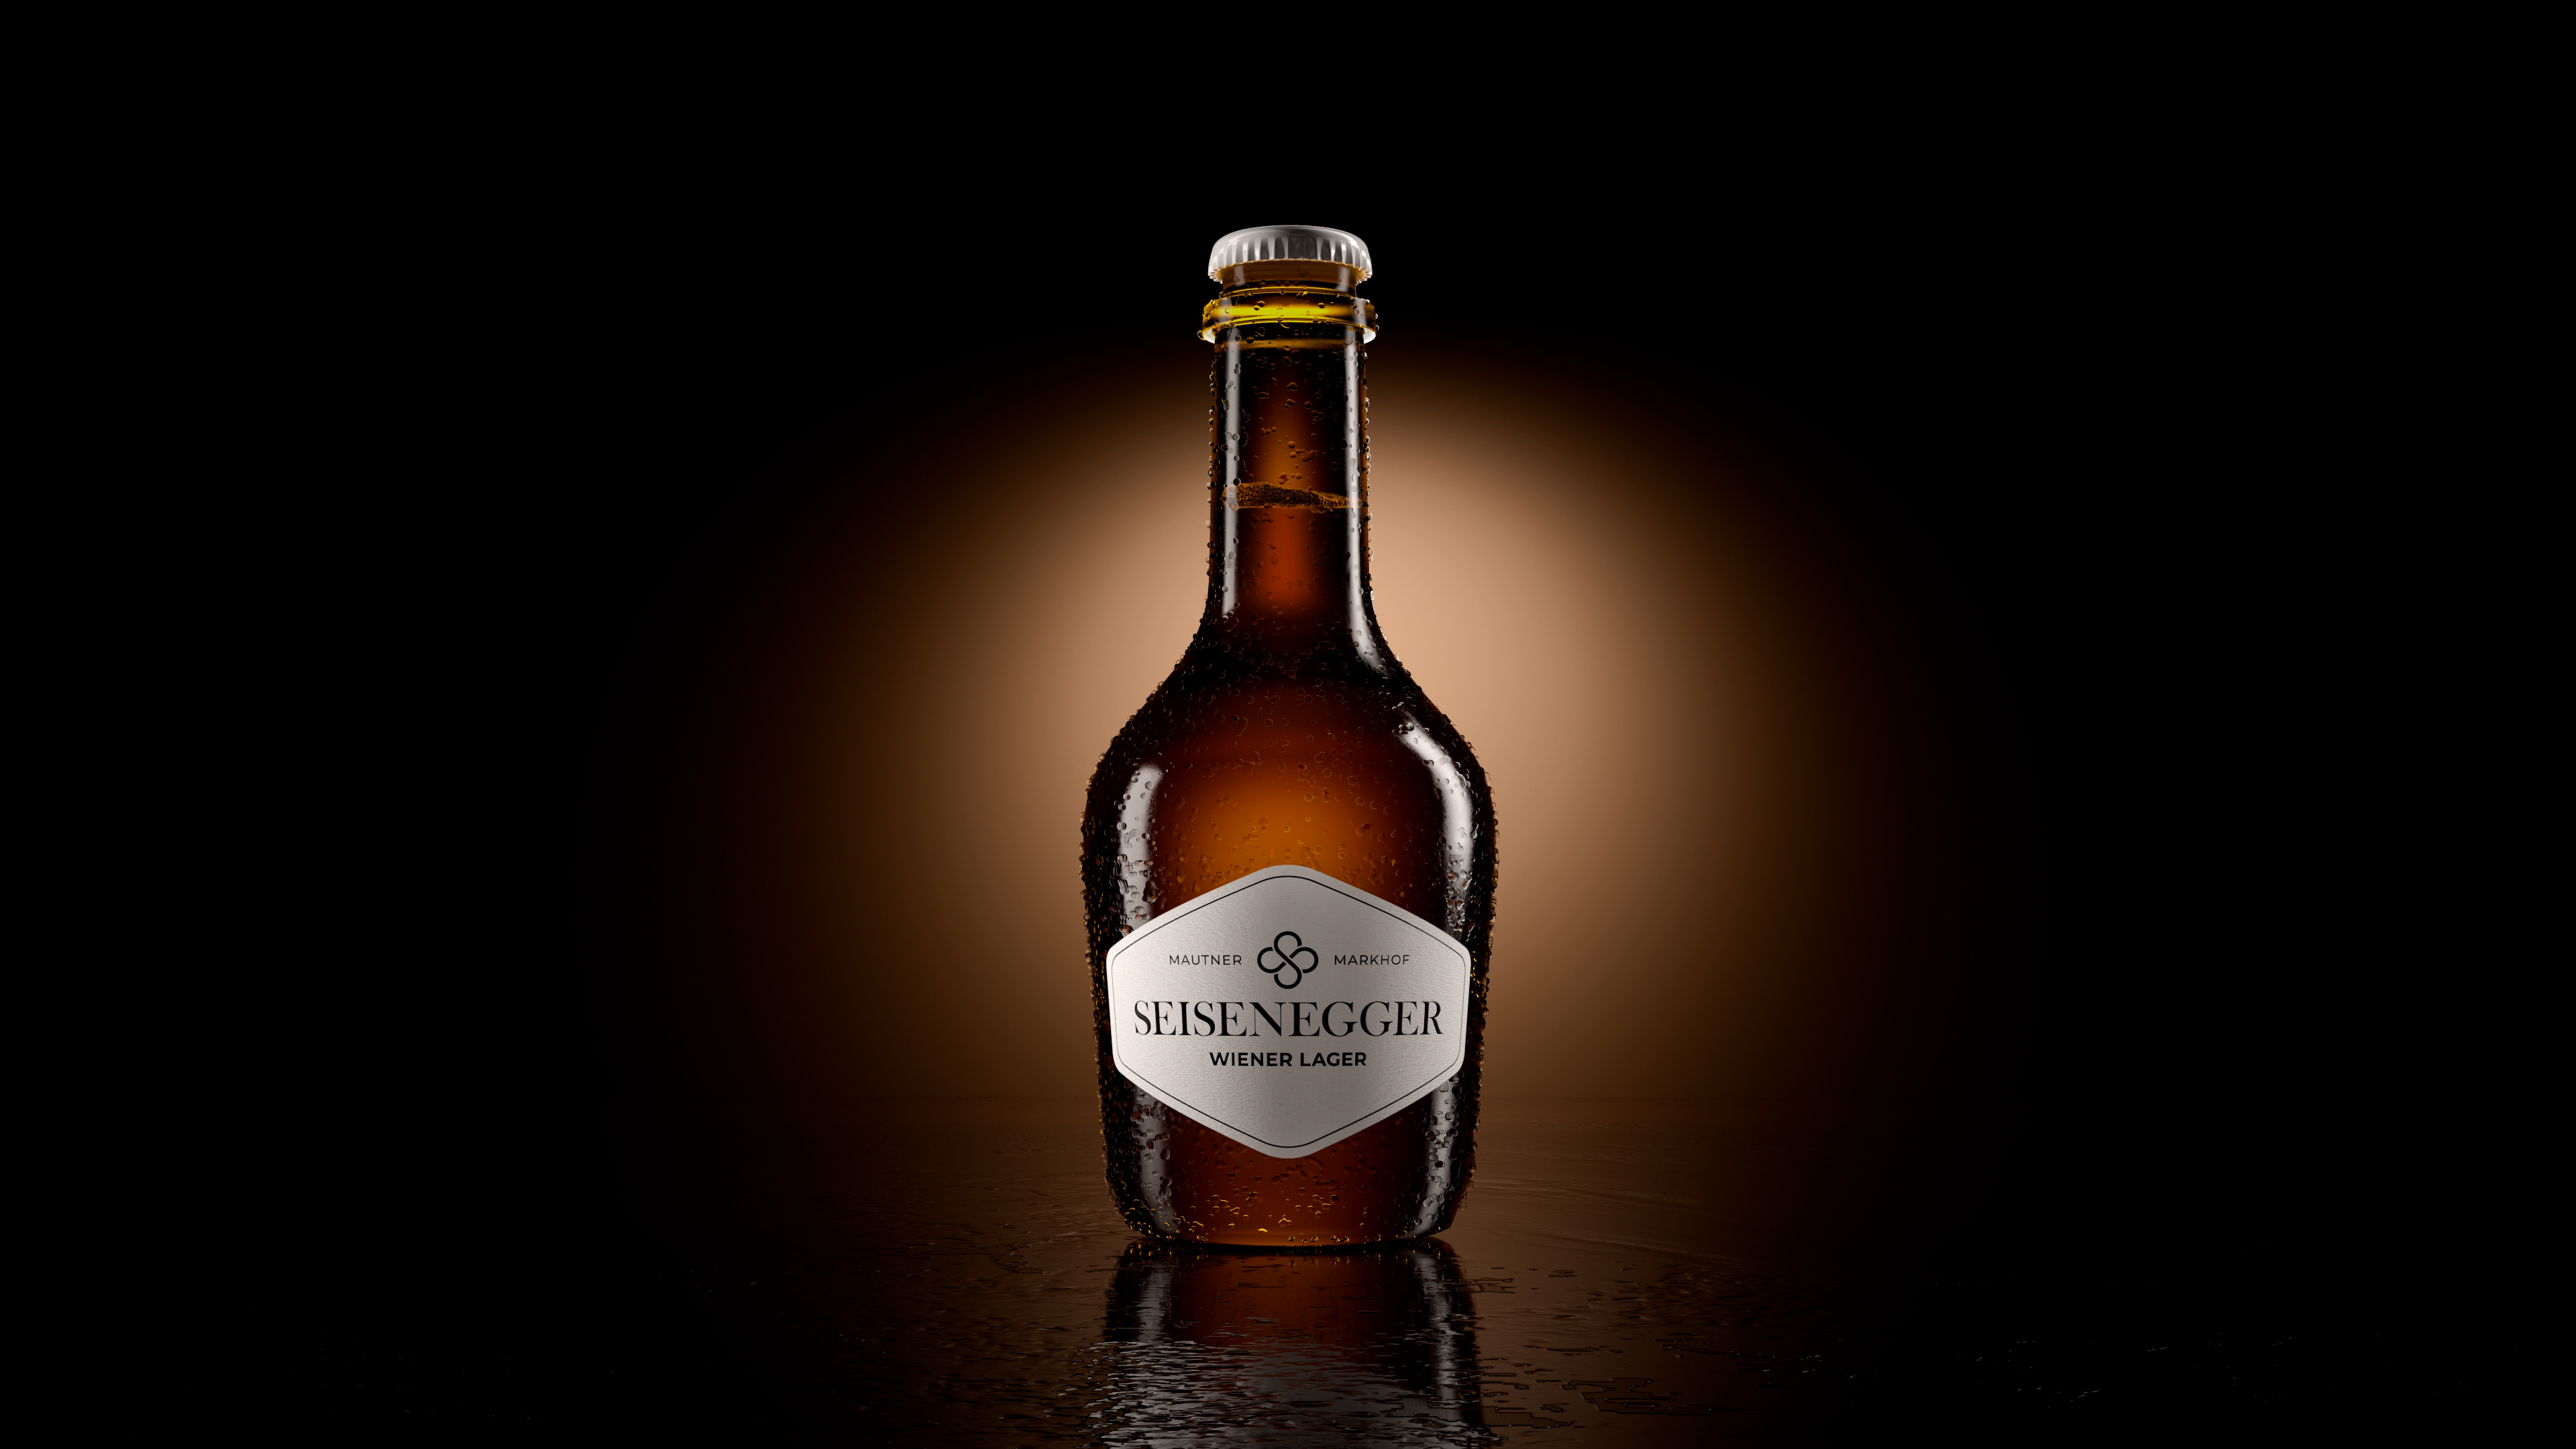 Seisenegger Beer - Vienna Lager